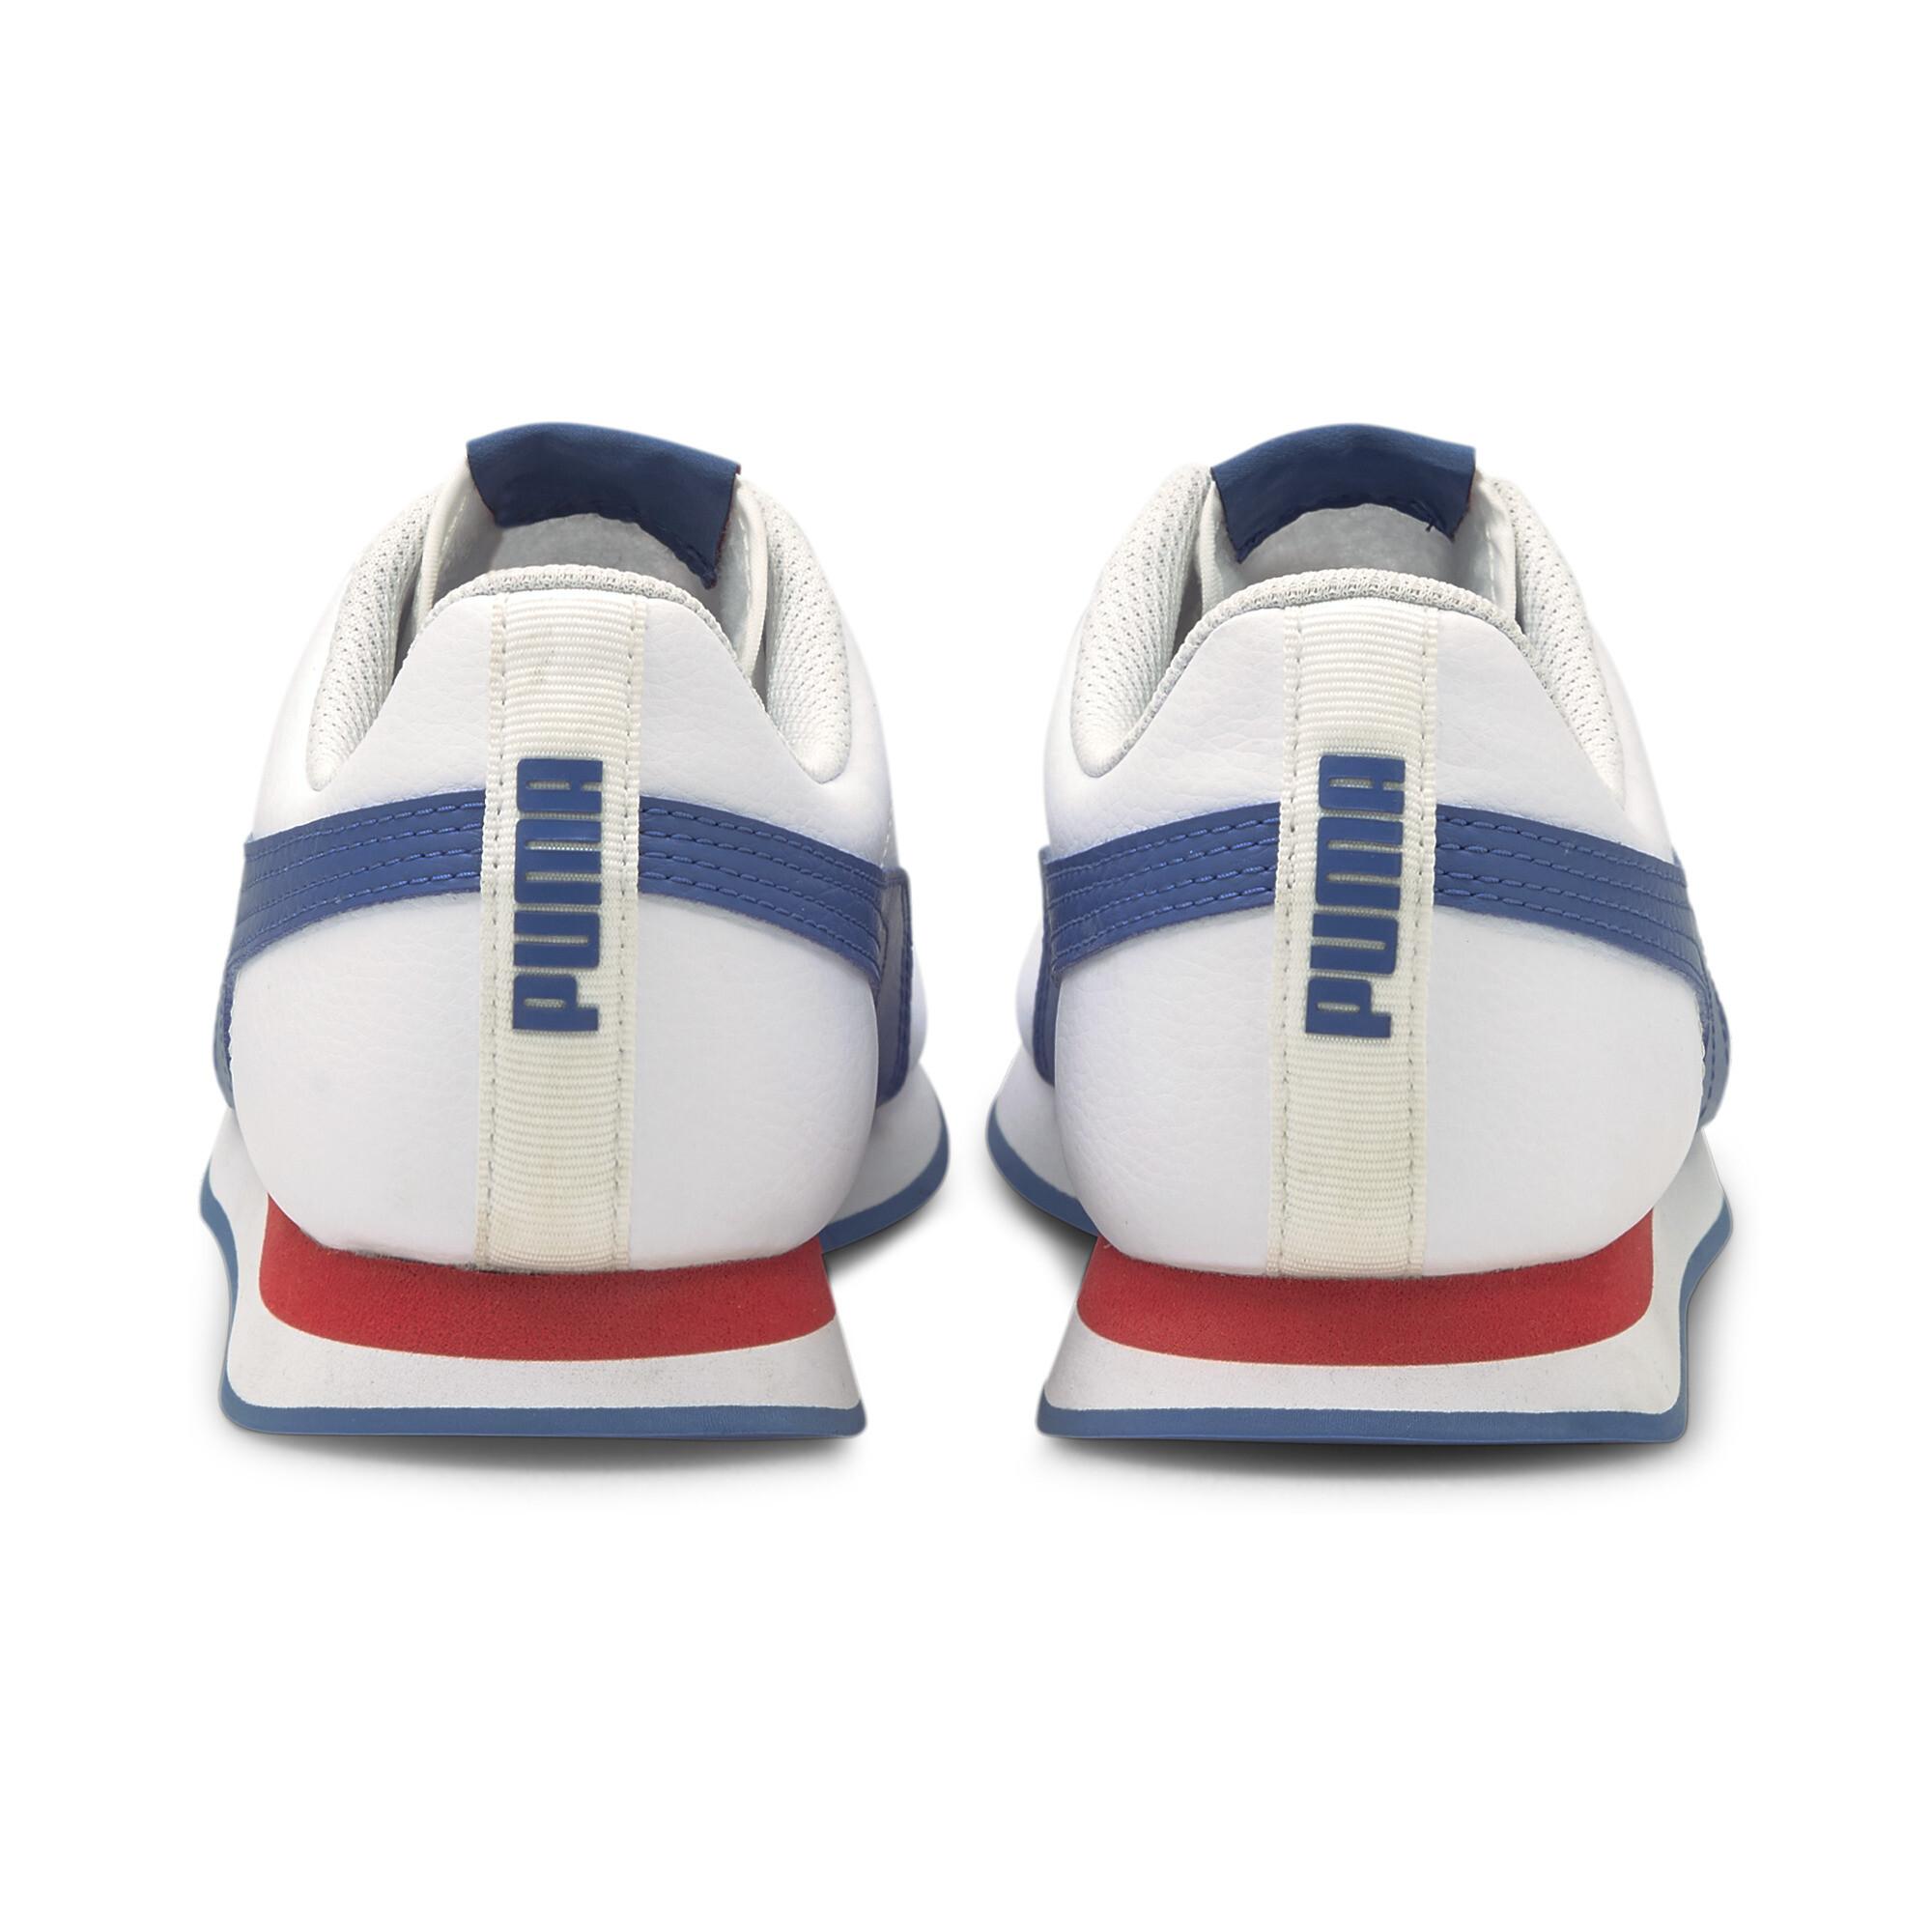 thumbnail 20 - PUMA Men's Turin II Sneakers